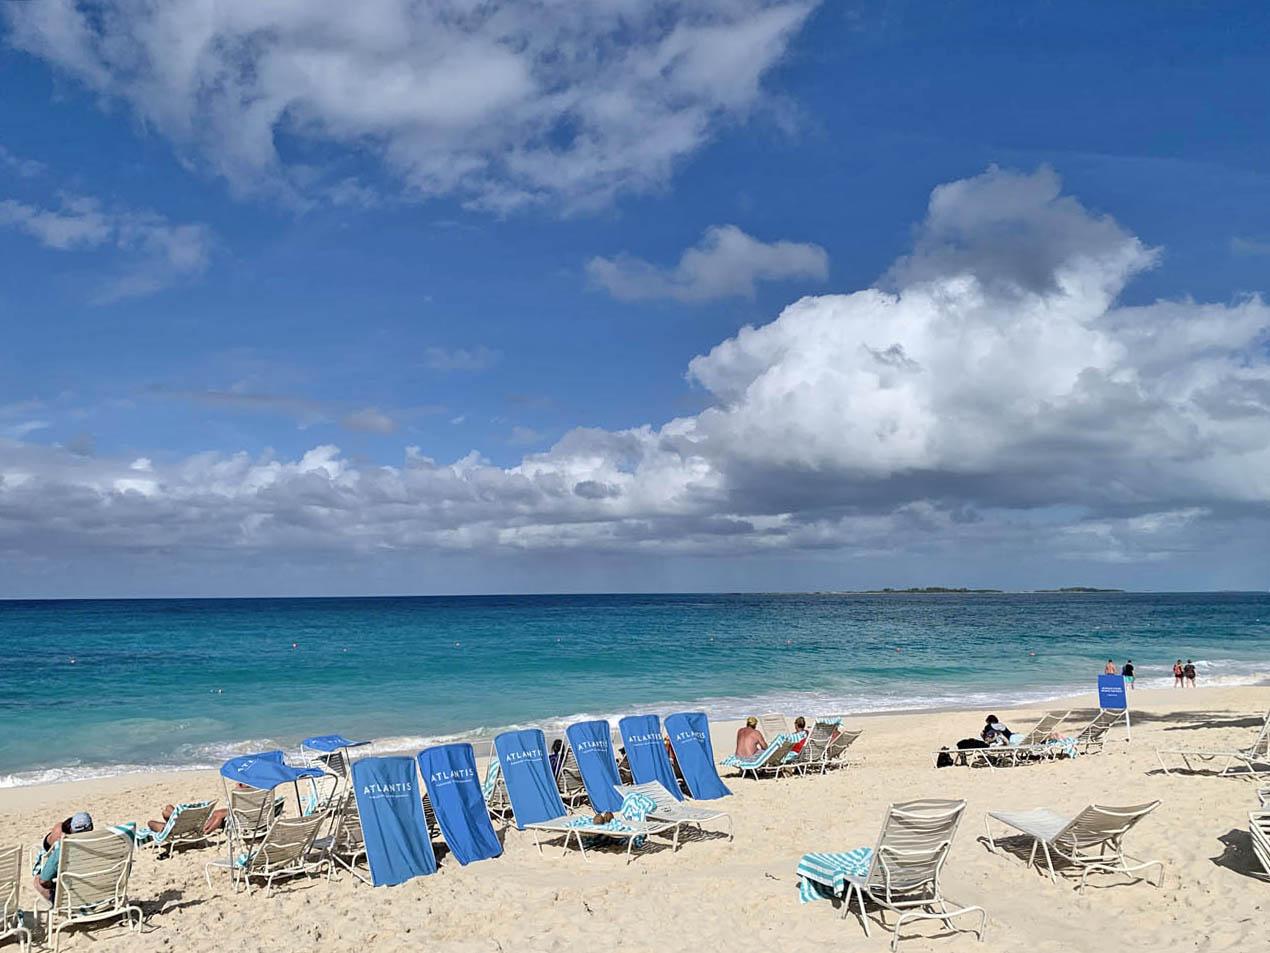 praia do Atlantis Bahamas - Paradise Island - Nassau